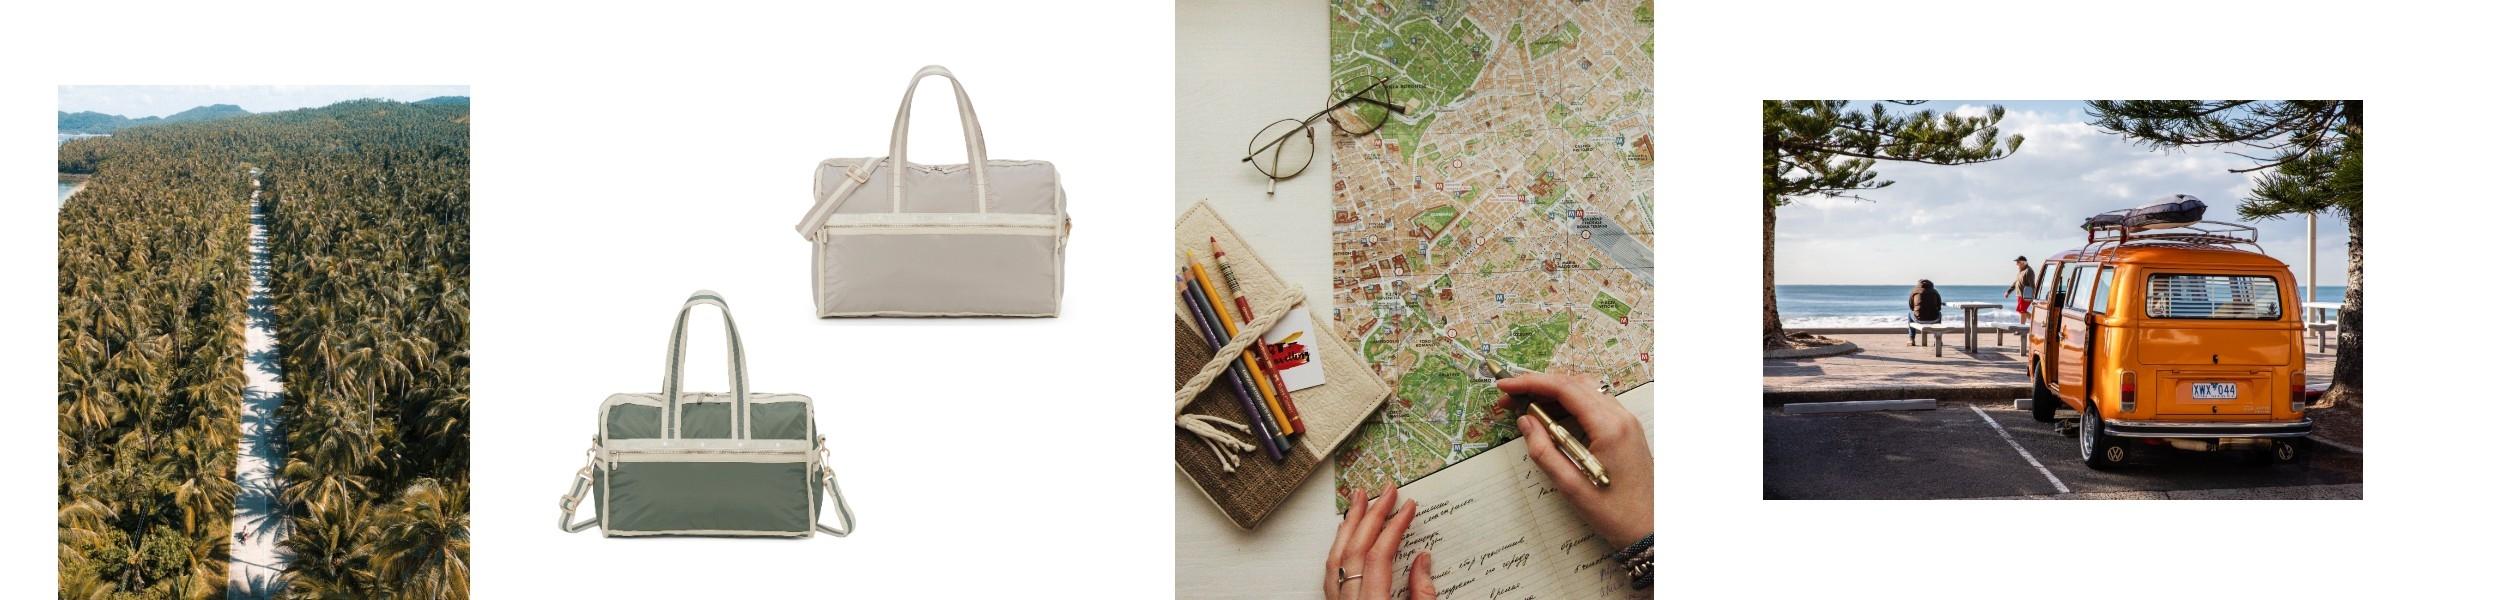 lesportsac 旅行包包款